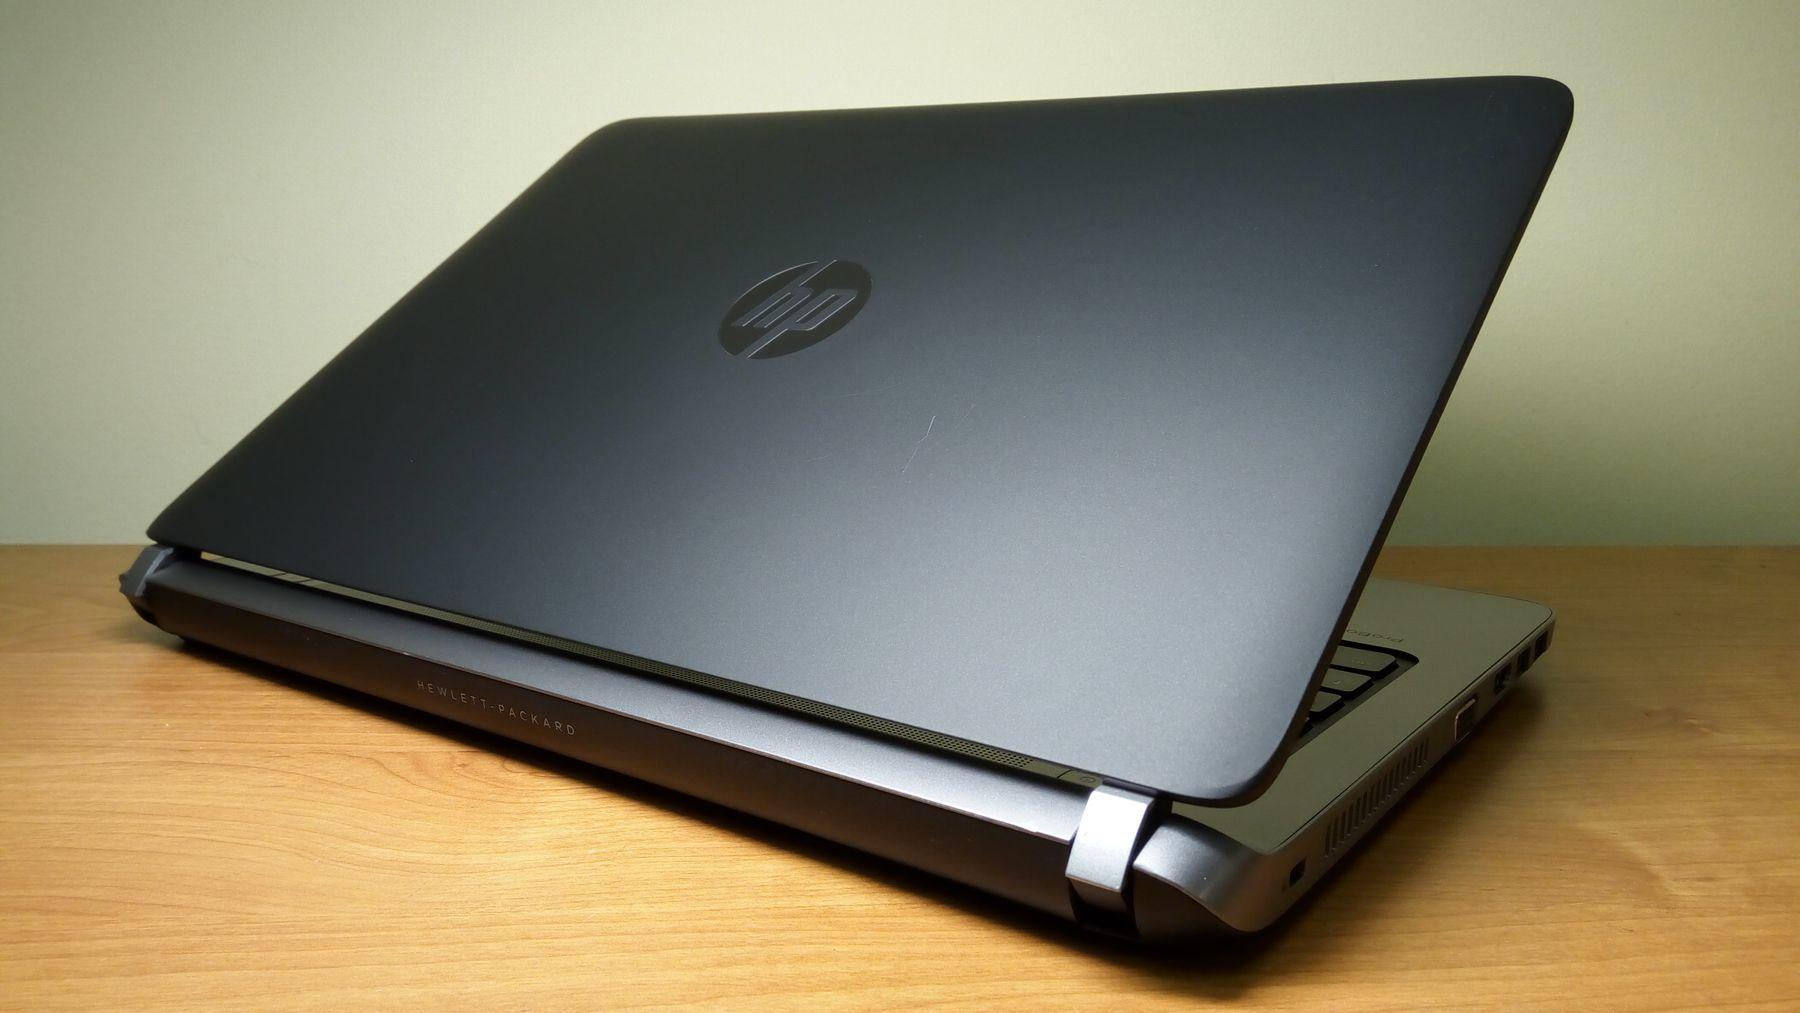 Hp Probook 430 G2 Core i5 2 50GHz 4GB RAM 500GB HDD 13